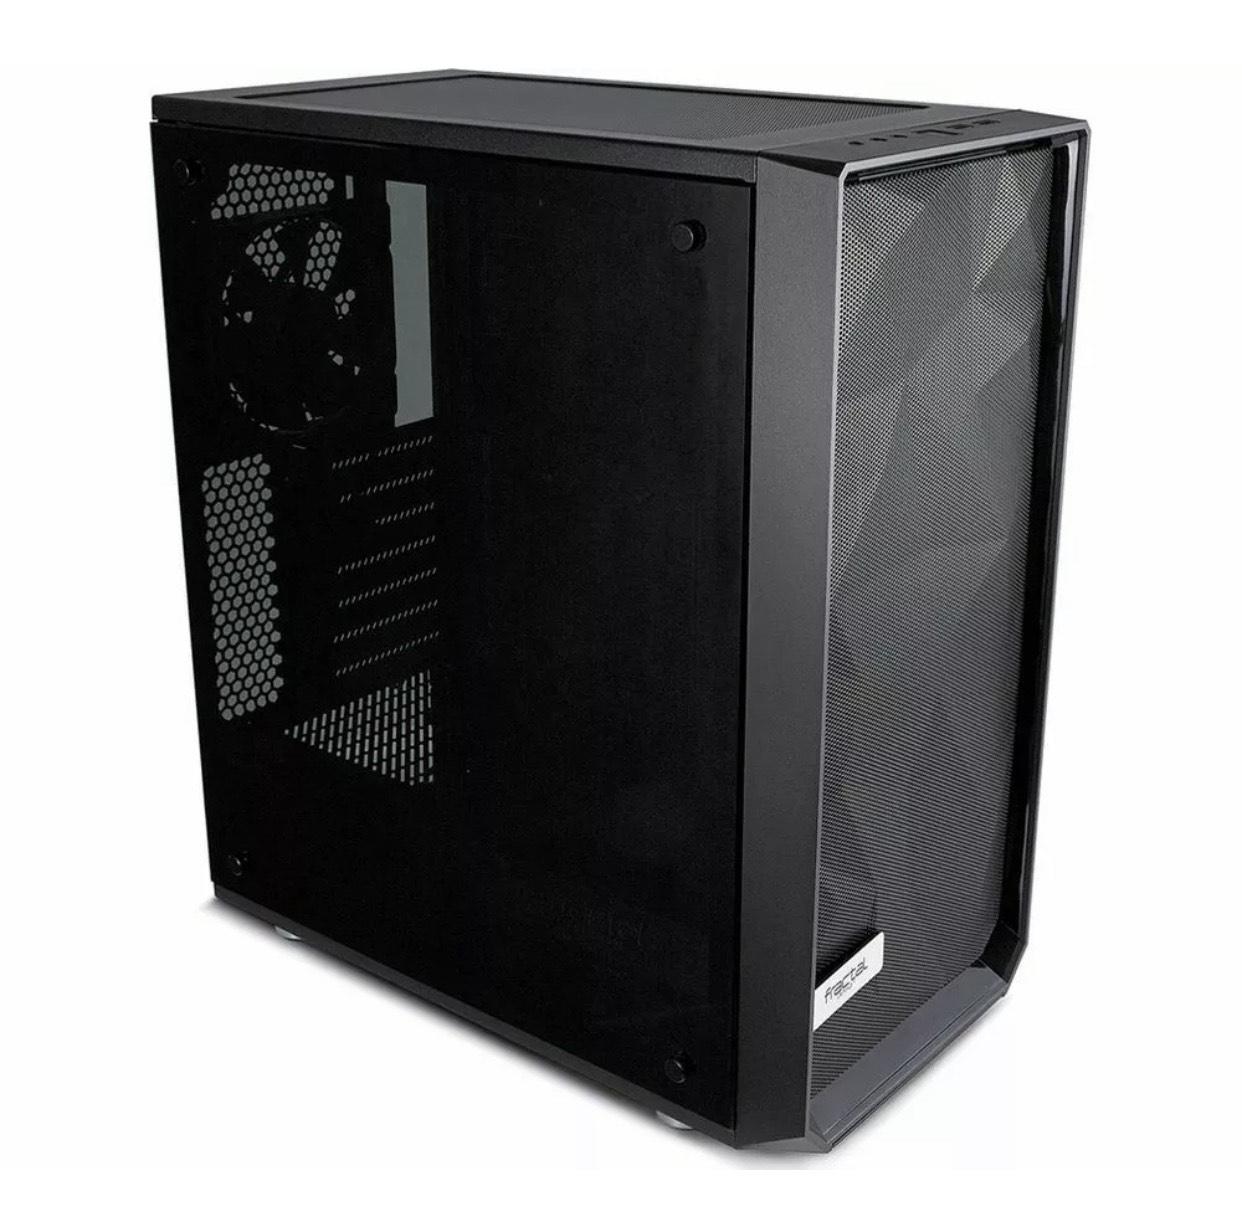 FRACTAL DESIGN Meshify C Blackout ATX Mid Tower PC Case £69.99 Currys